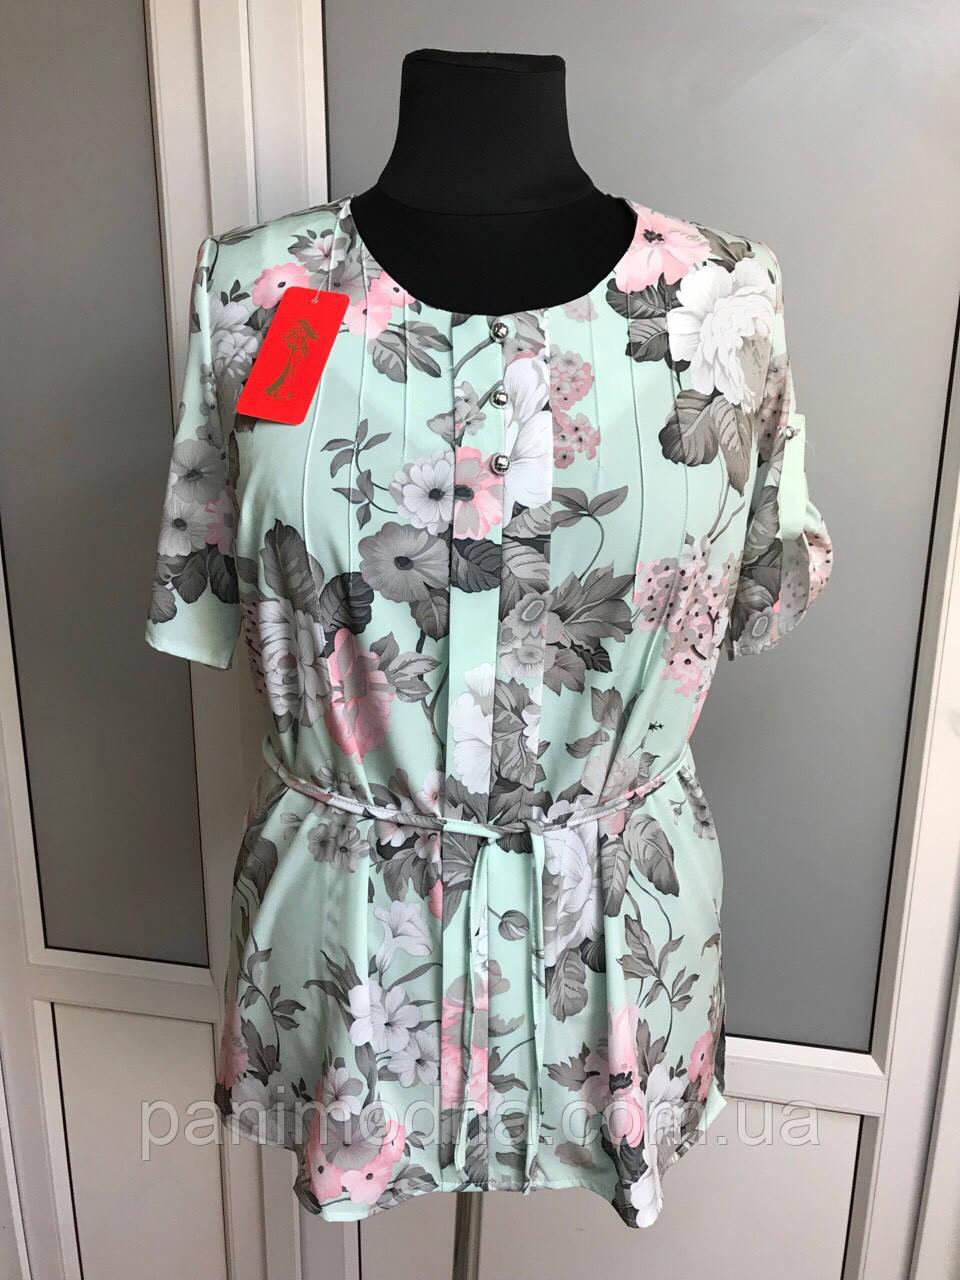 "Блуза   ""ФОРУМ"". От производителя - швейная фабрика."